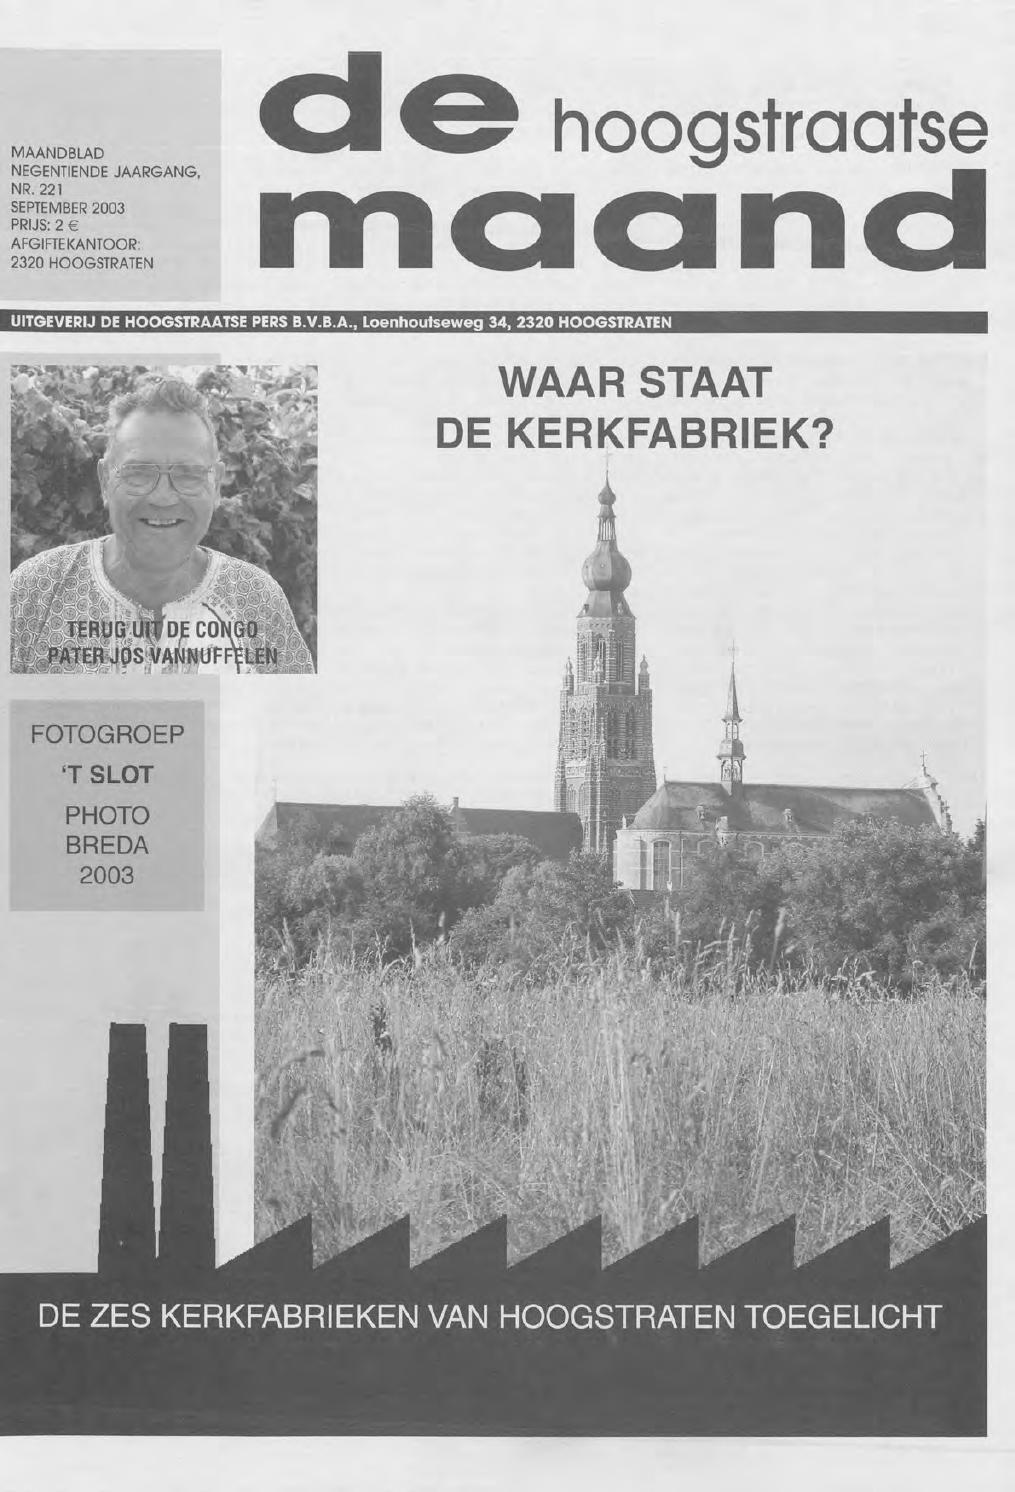 b3954815e72 september 2003 - De Hoogstraatse Maand by De Hoogstraatse Maand - issuu